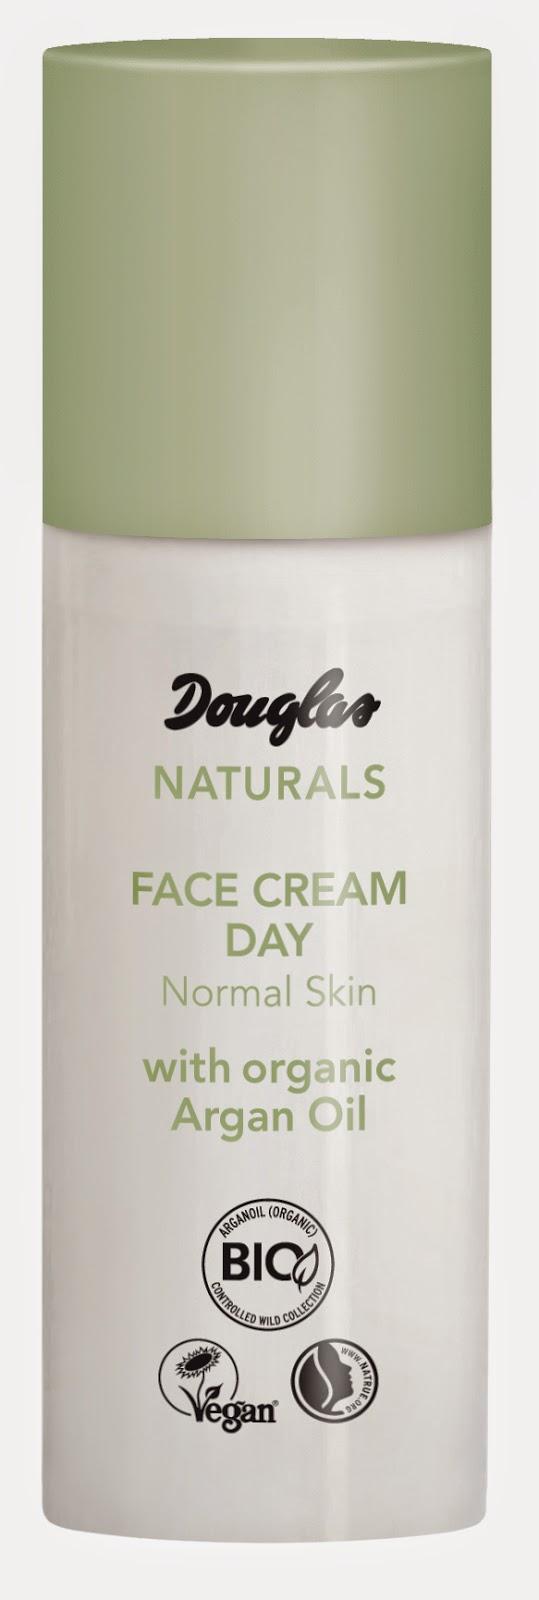 Douglas Naturals Day Cream Normal Skin